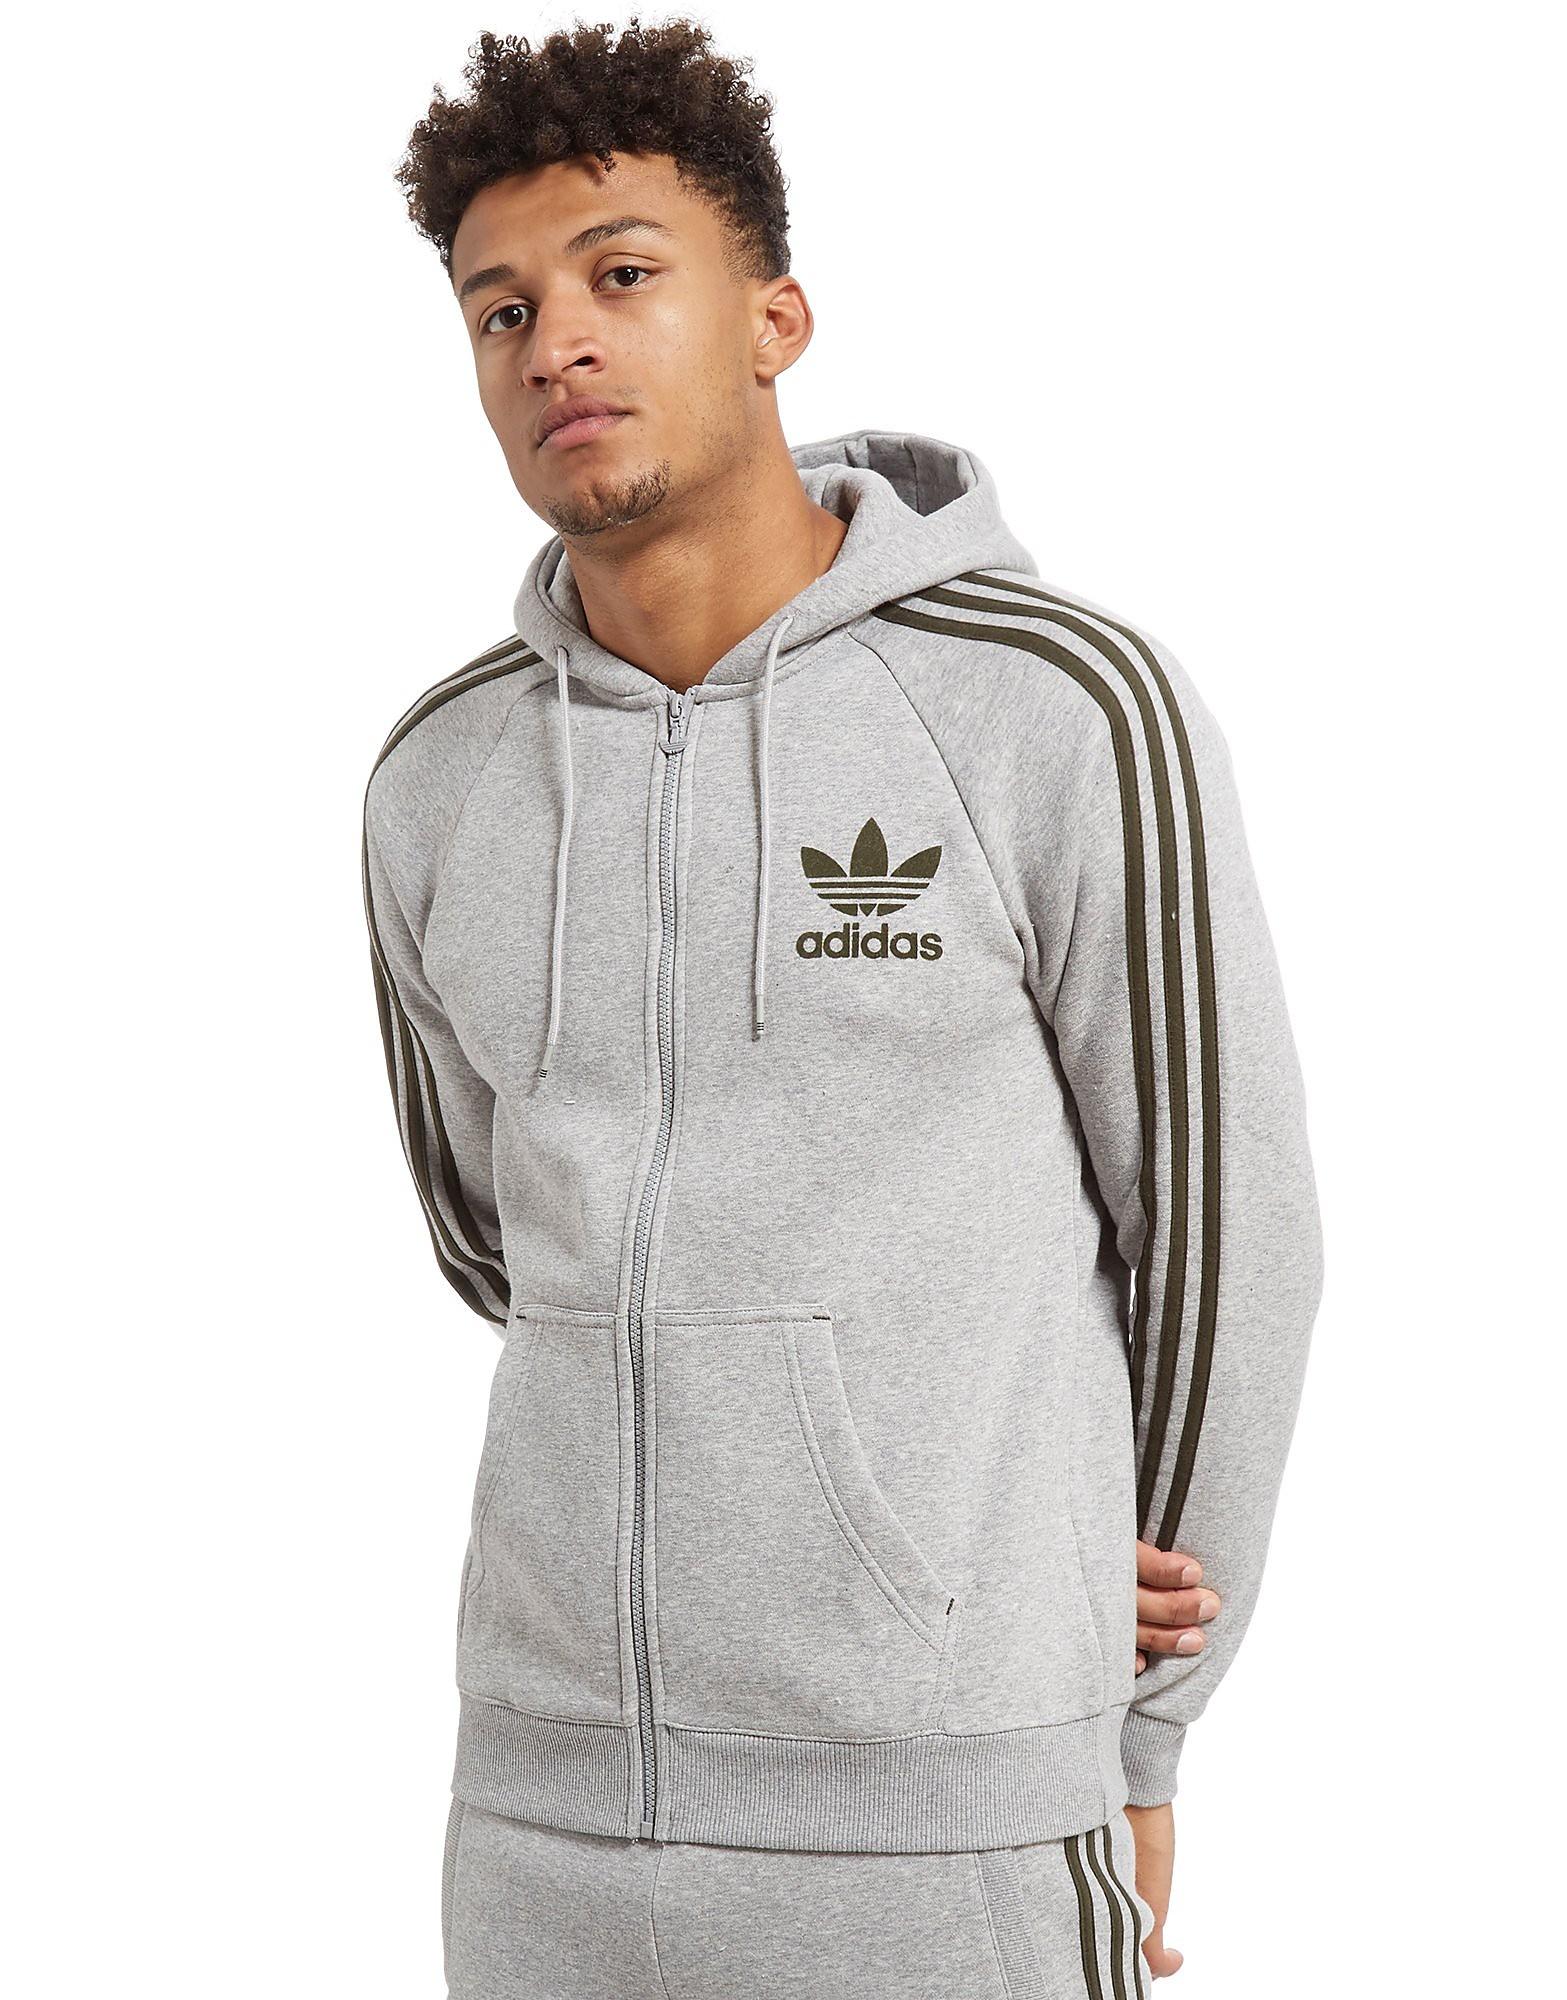 adidas Originals California Full Zip Hoody - Exclusive